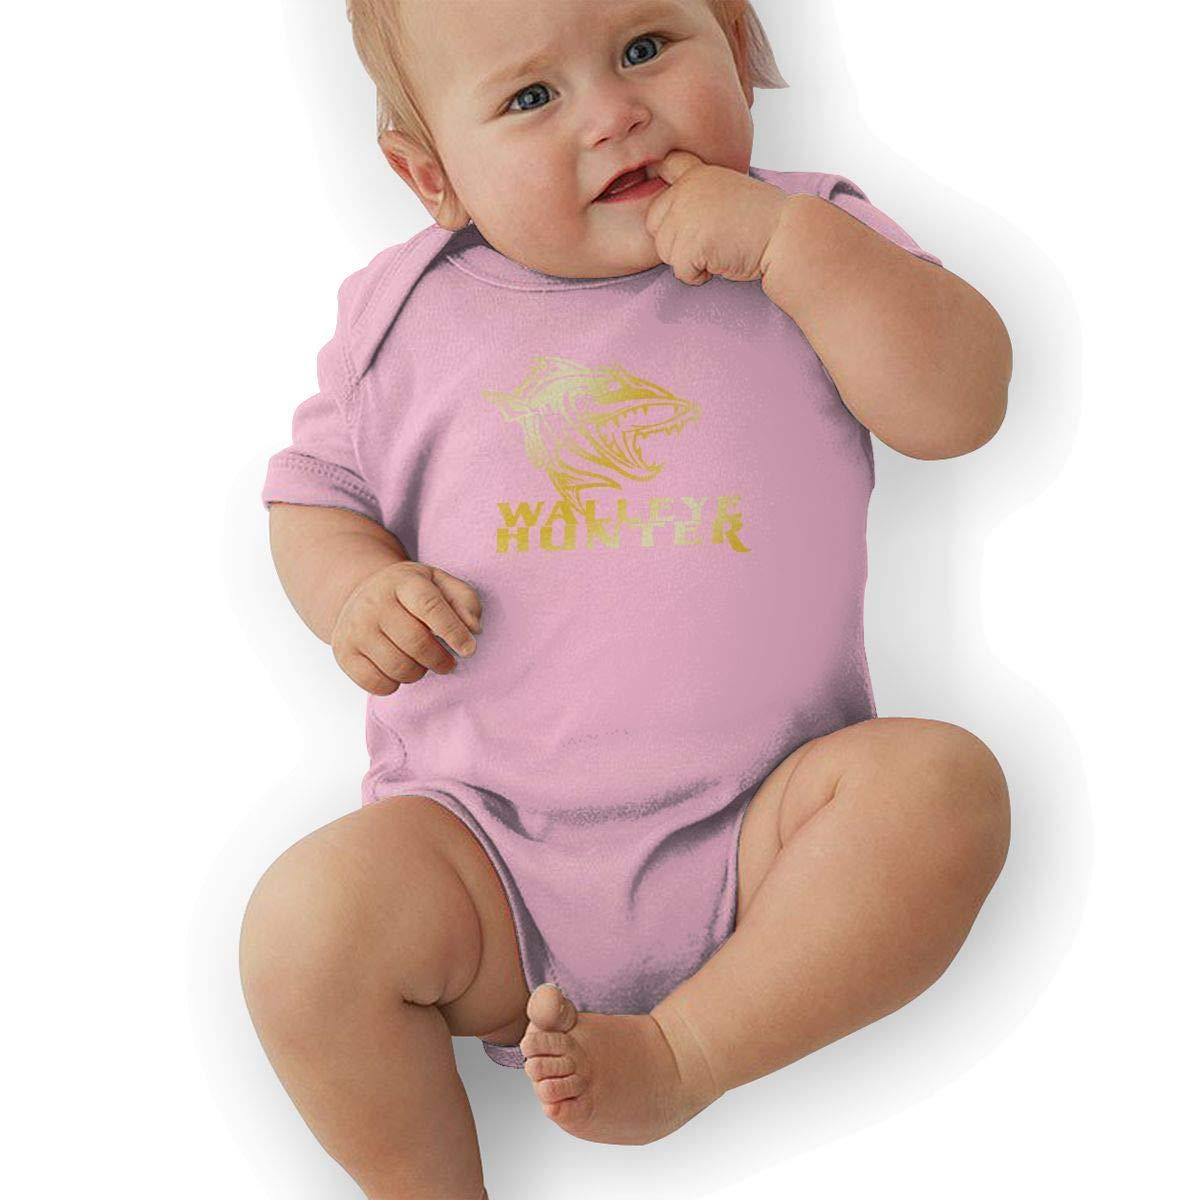 Newborn Baby Boys Bodysuit Short-Sleeve Onesie Walleye Hunter Print Jumpsuit Autumn Pajamas